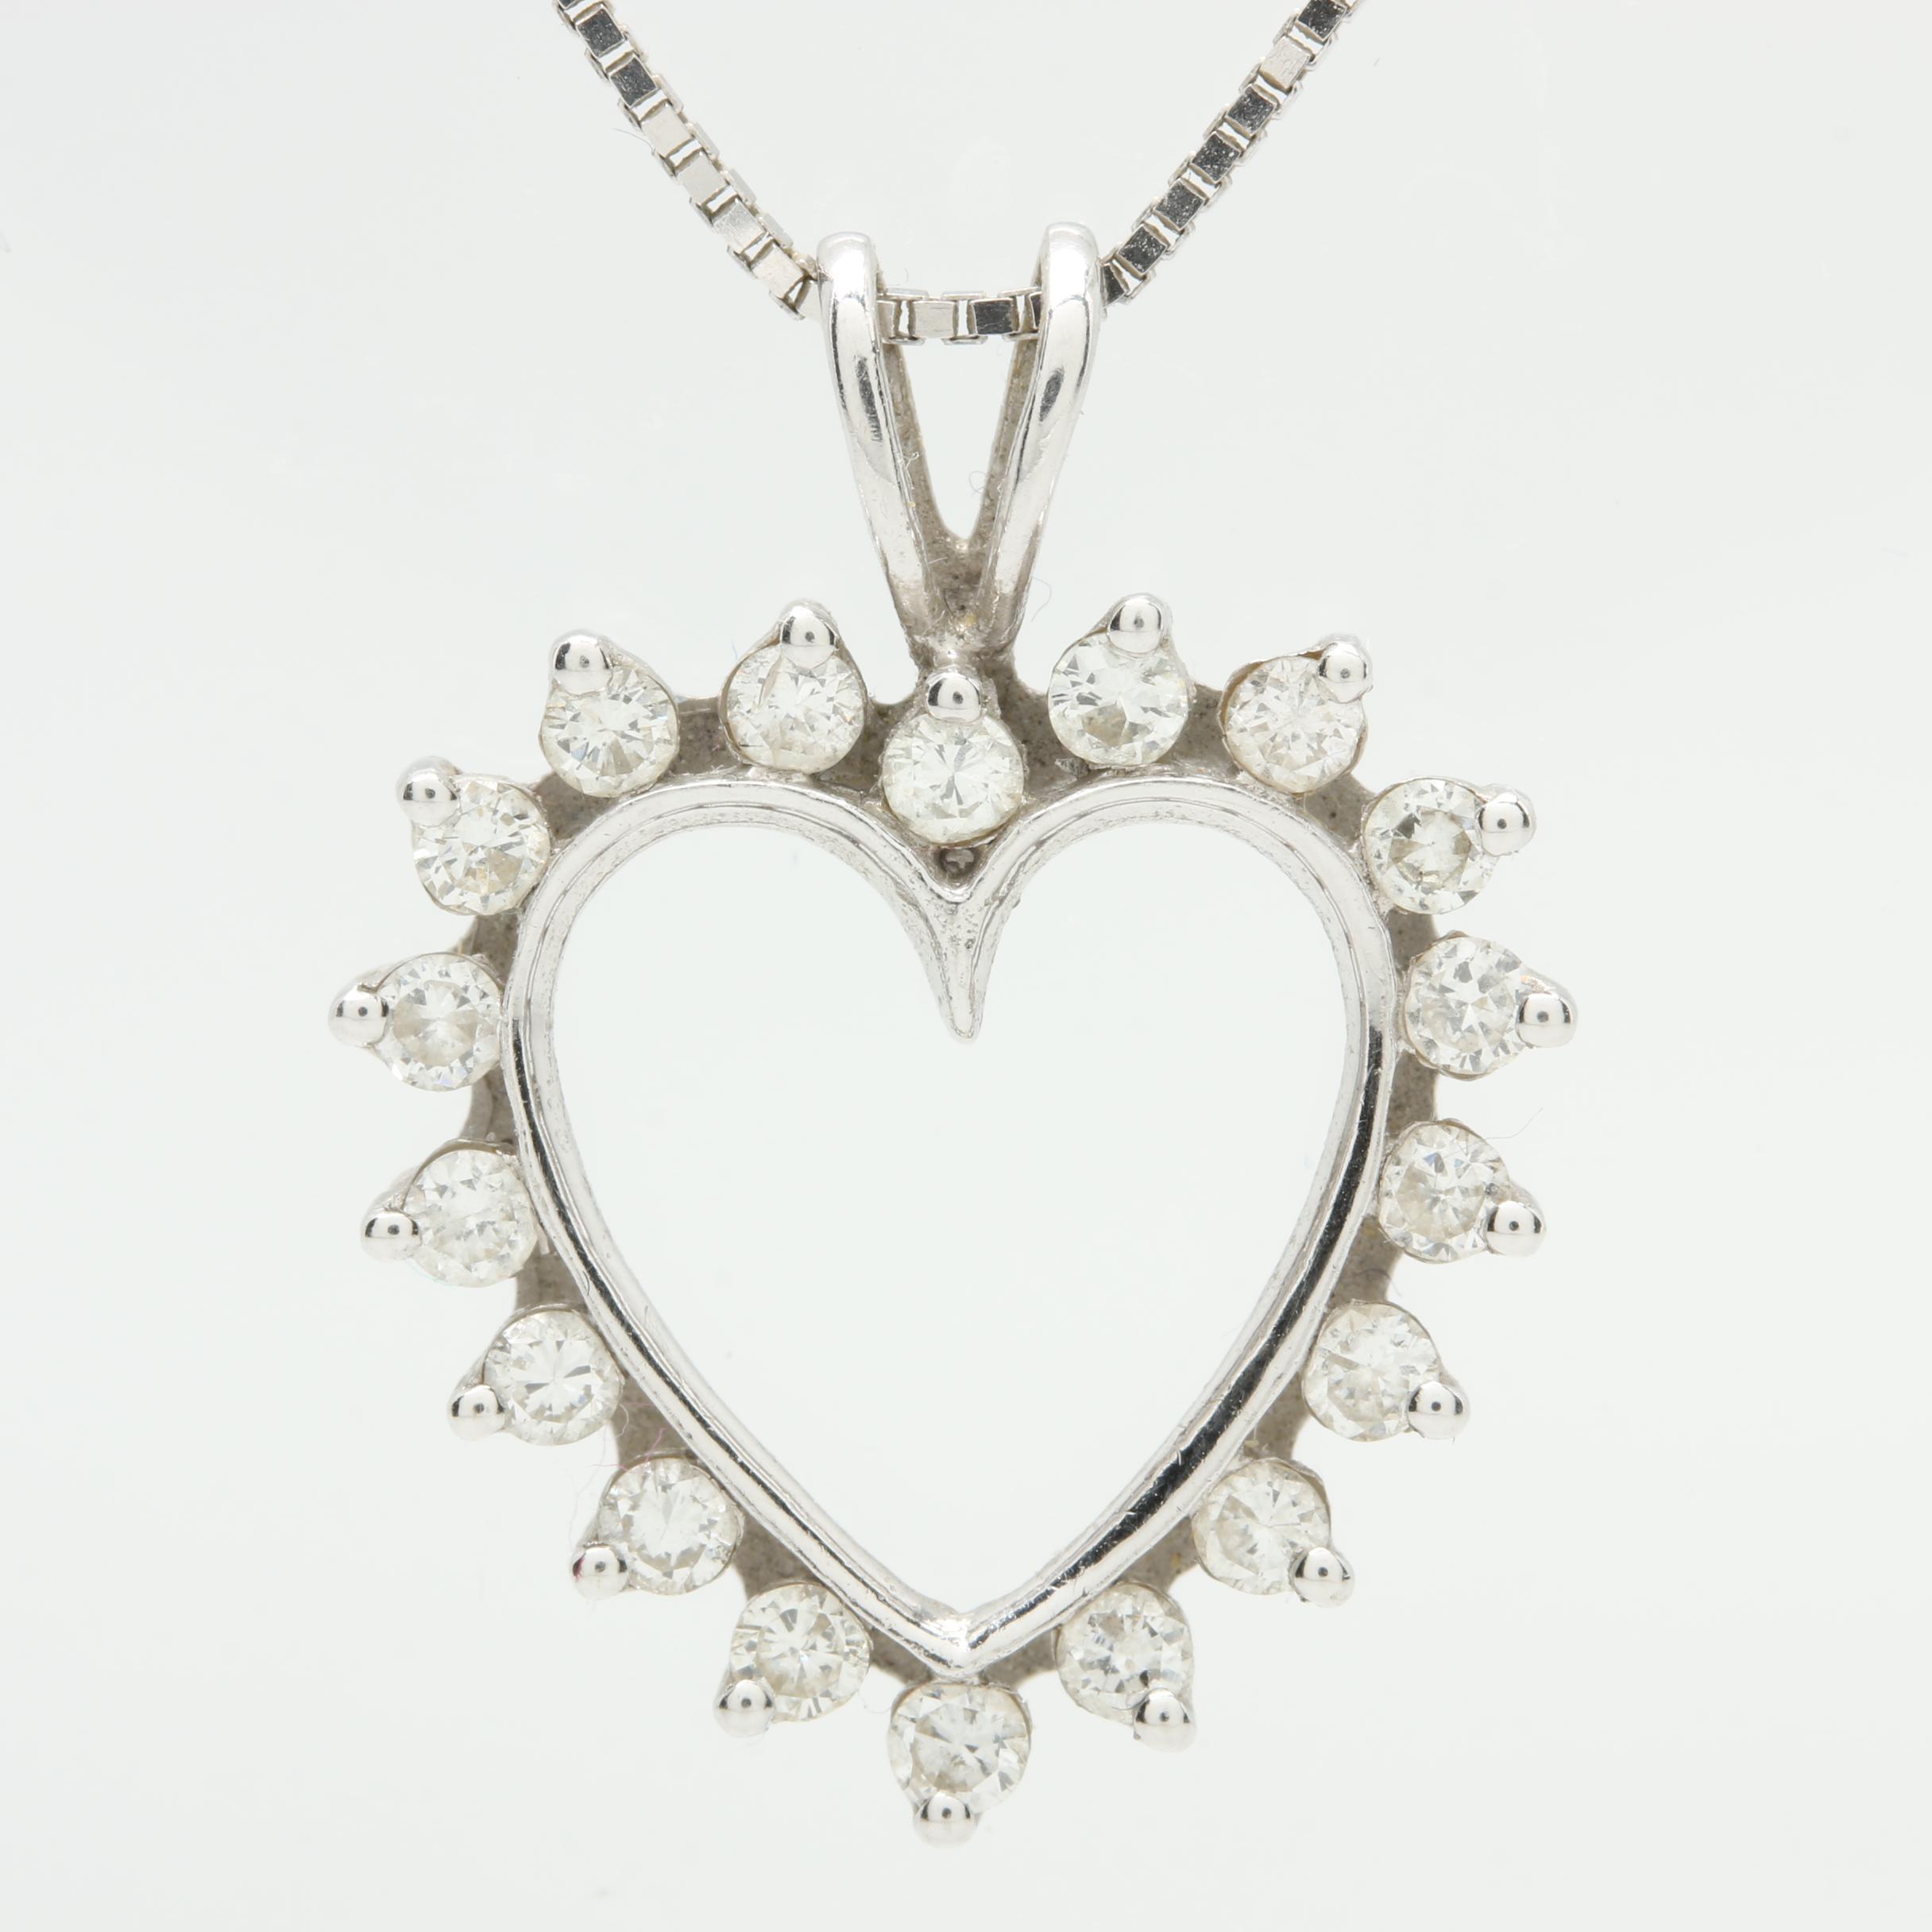 14K White Gold Diamond Open Heart Pendant Necklace